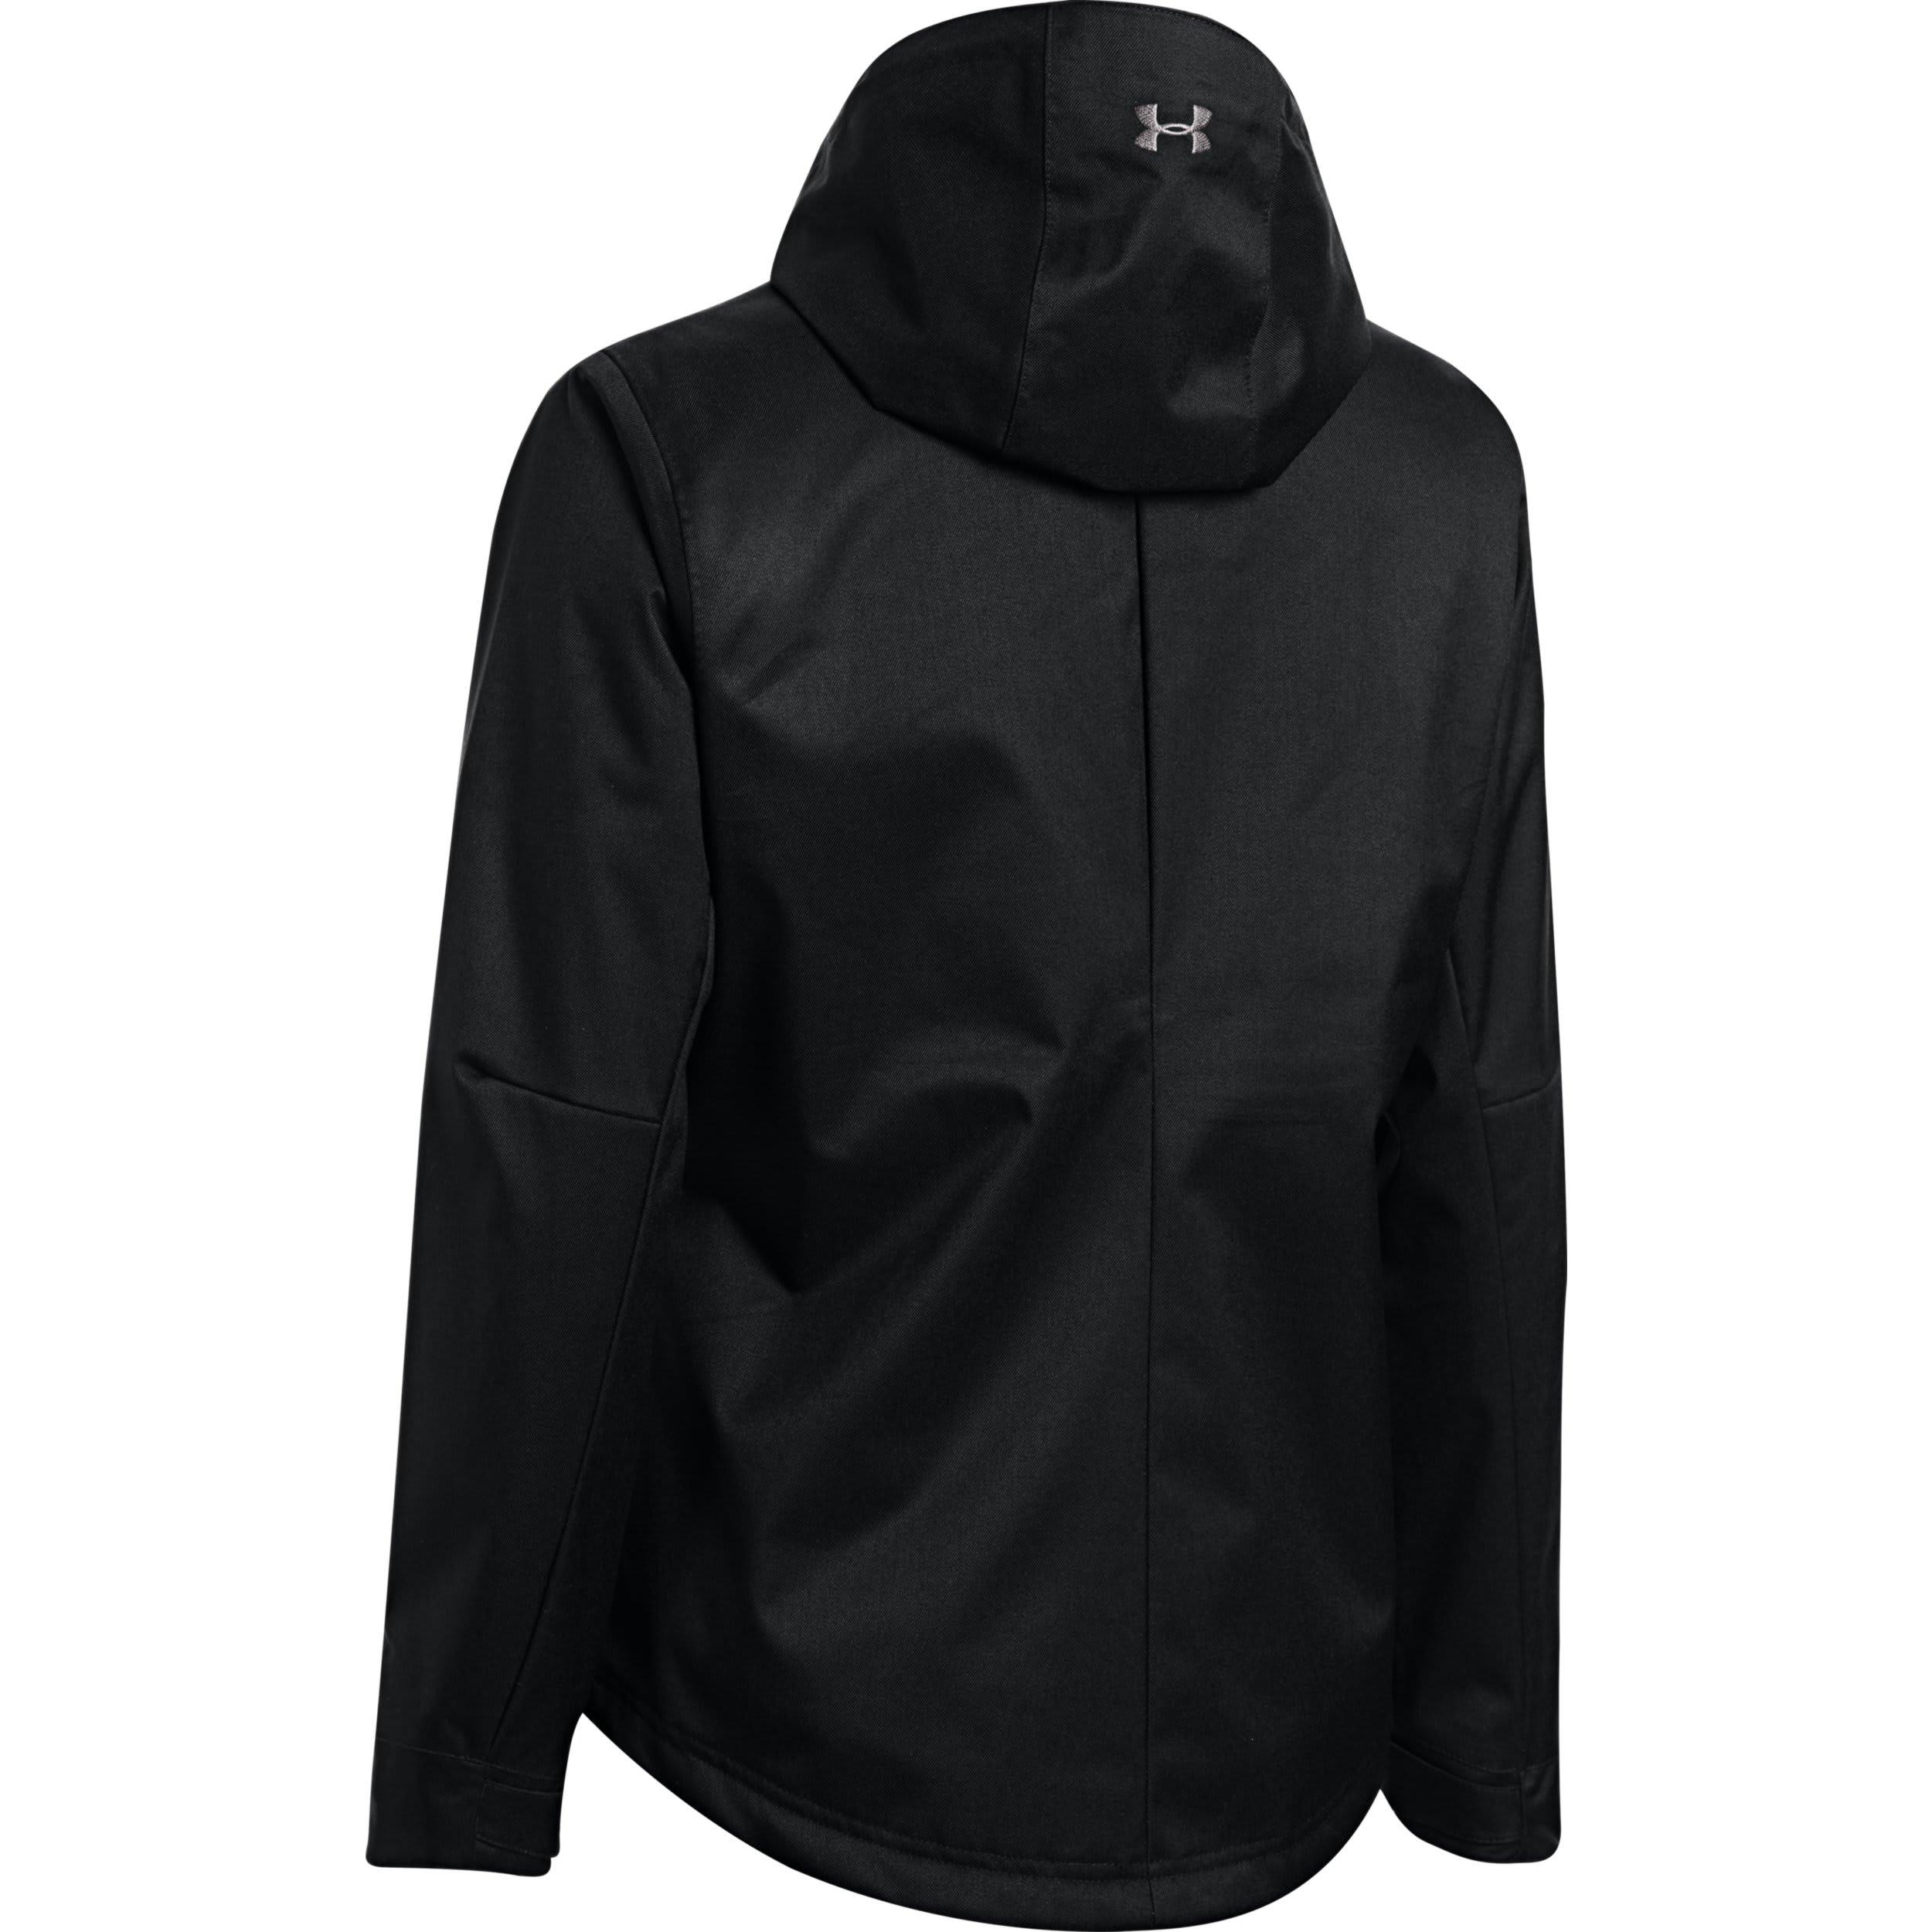 sales under armour jackets black